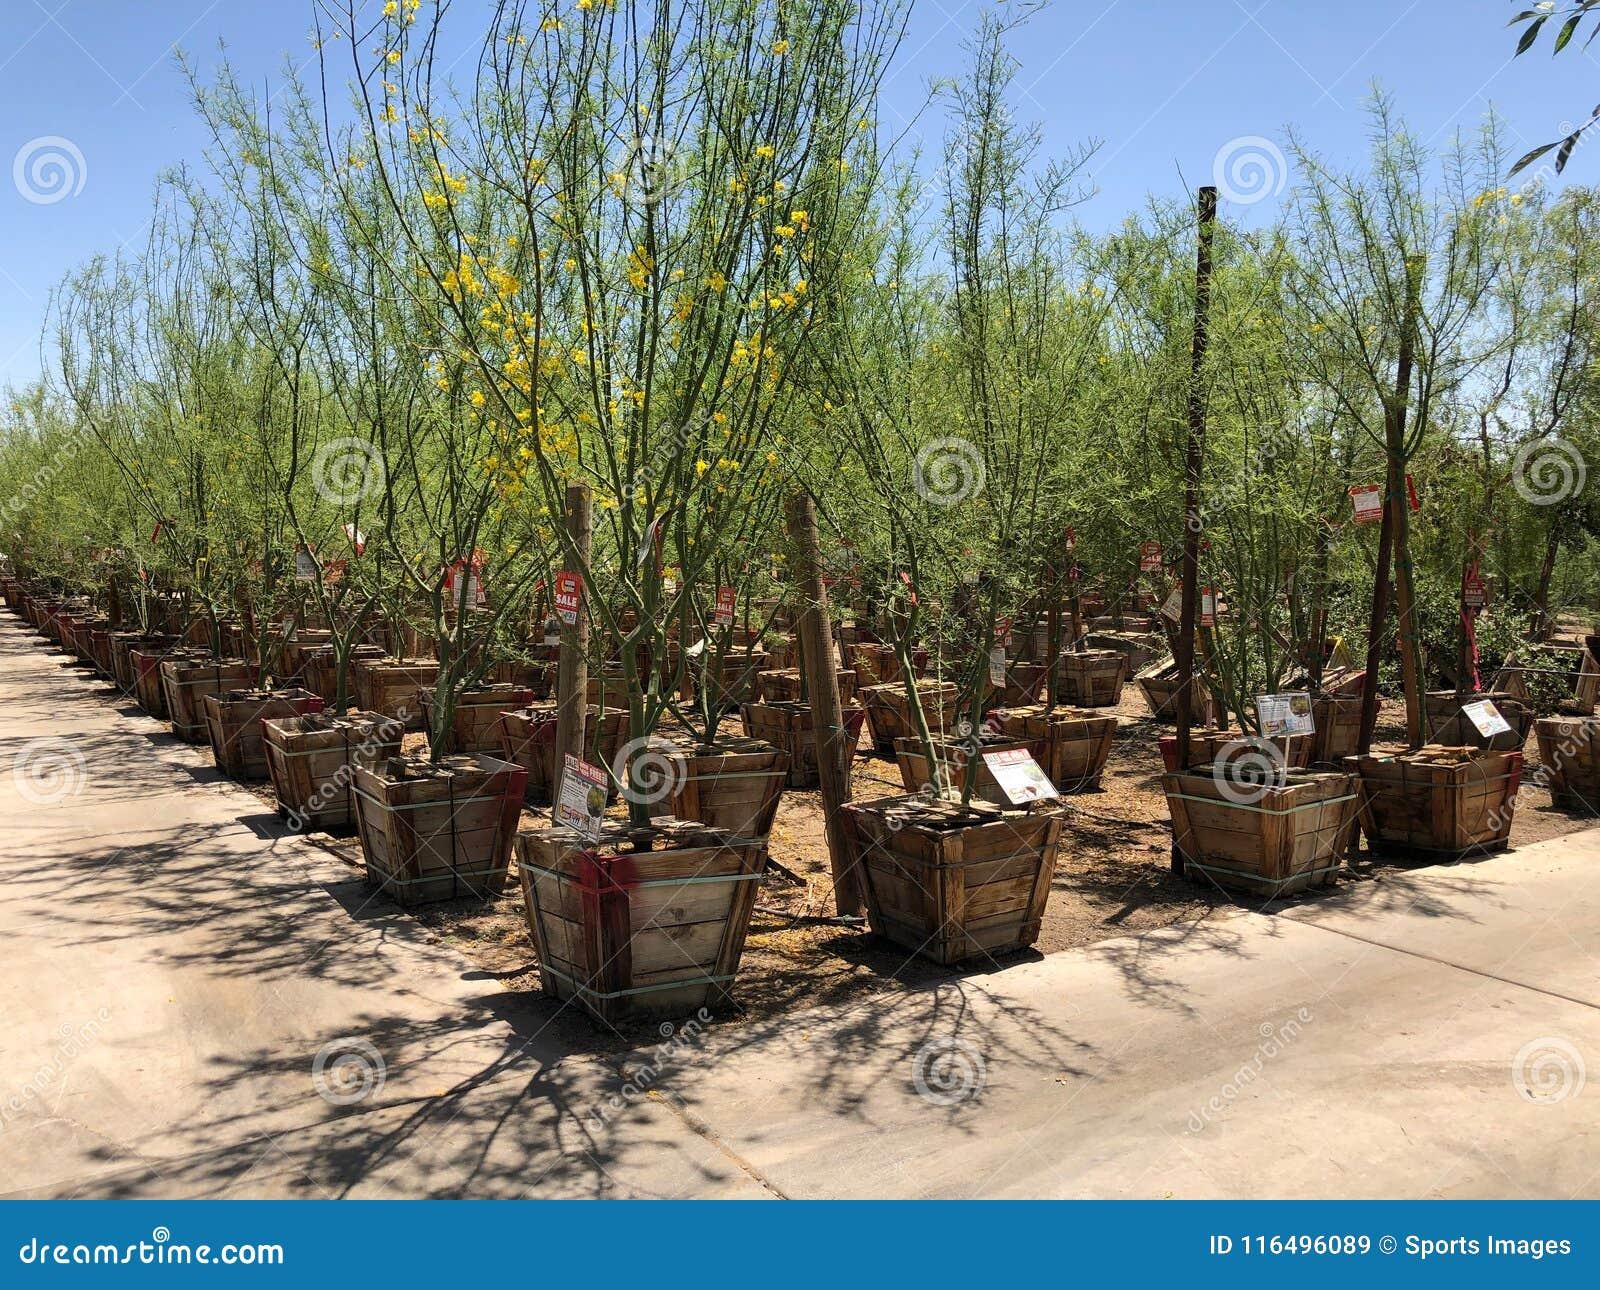 Nursery And Gardening Shop. Editorial Stock Image - Image of gilbert ...